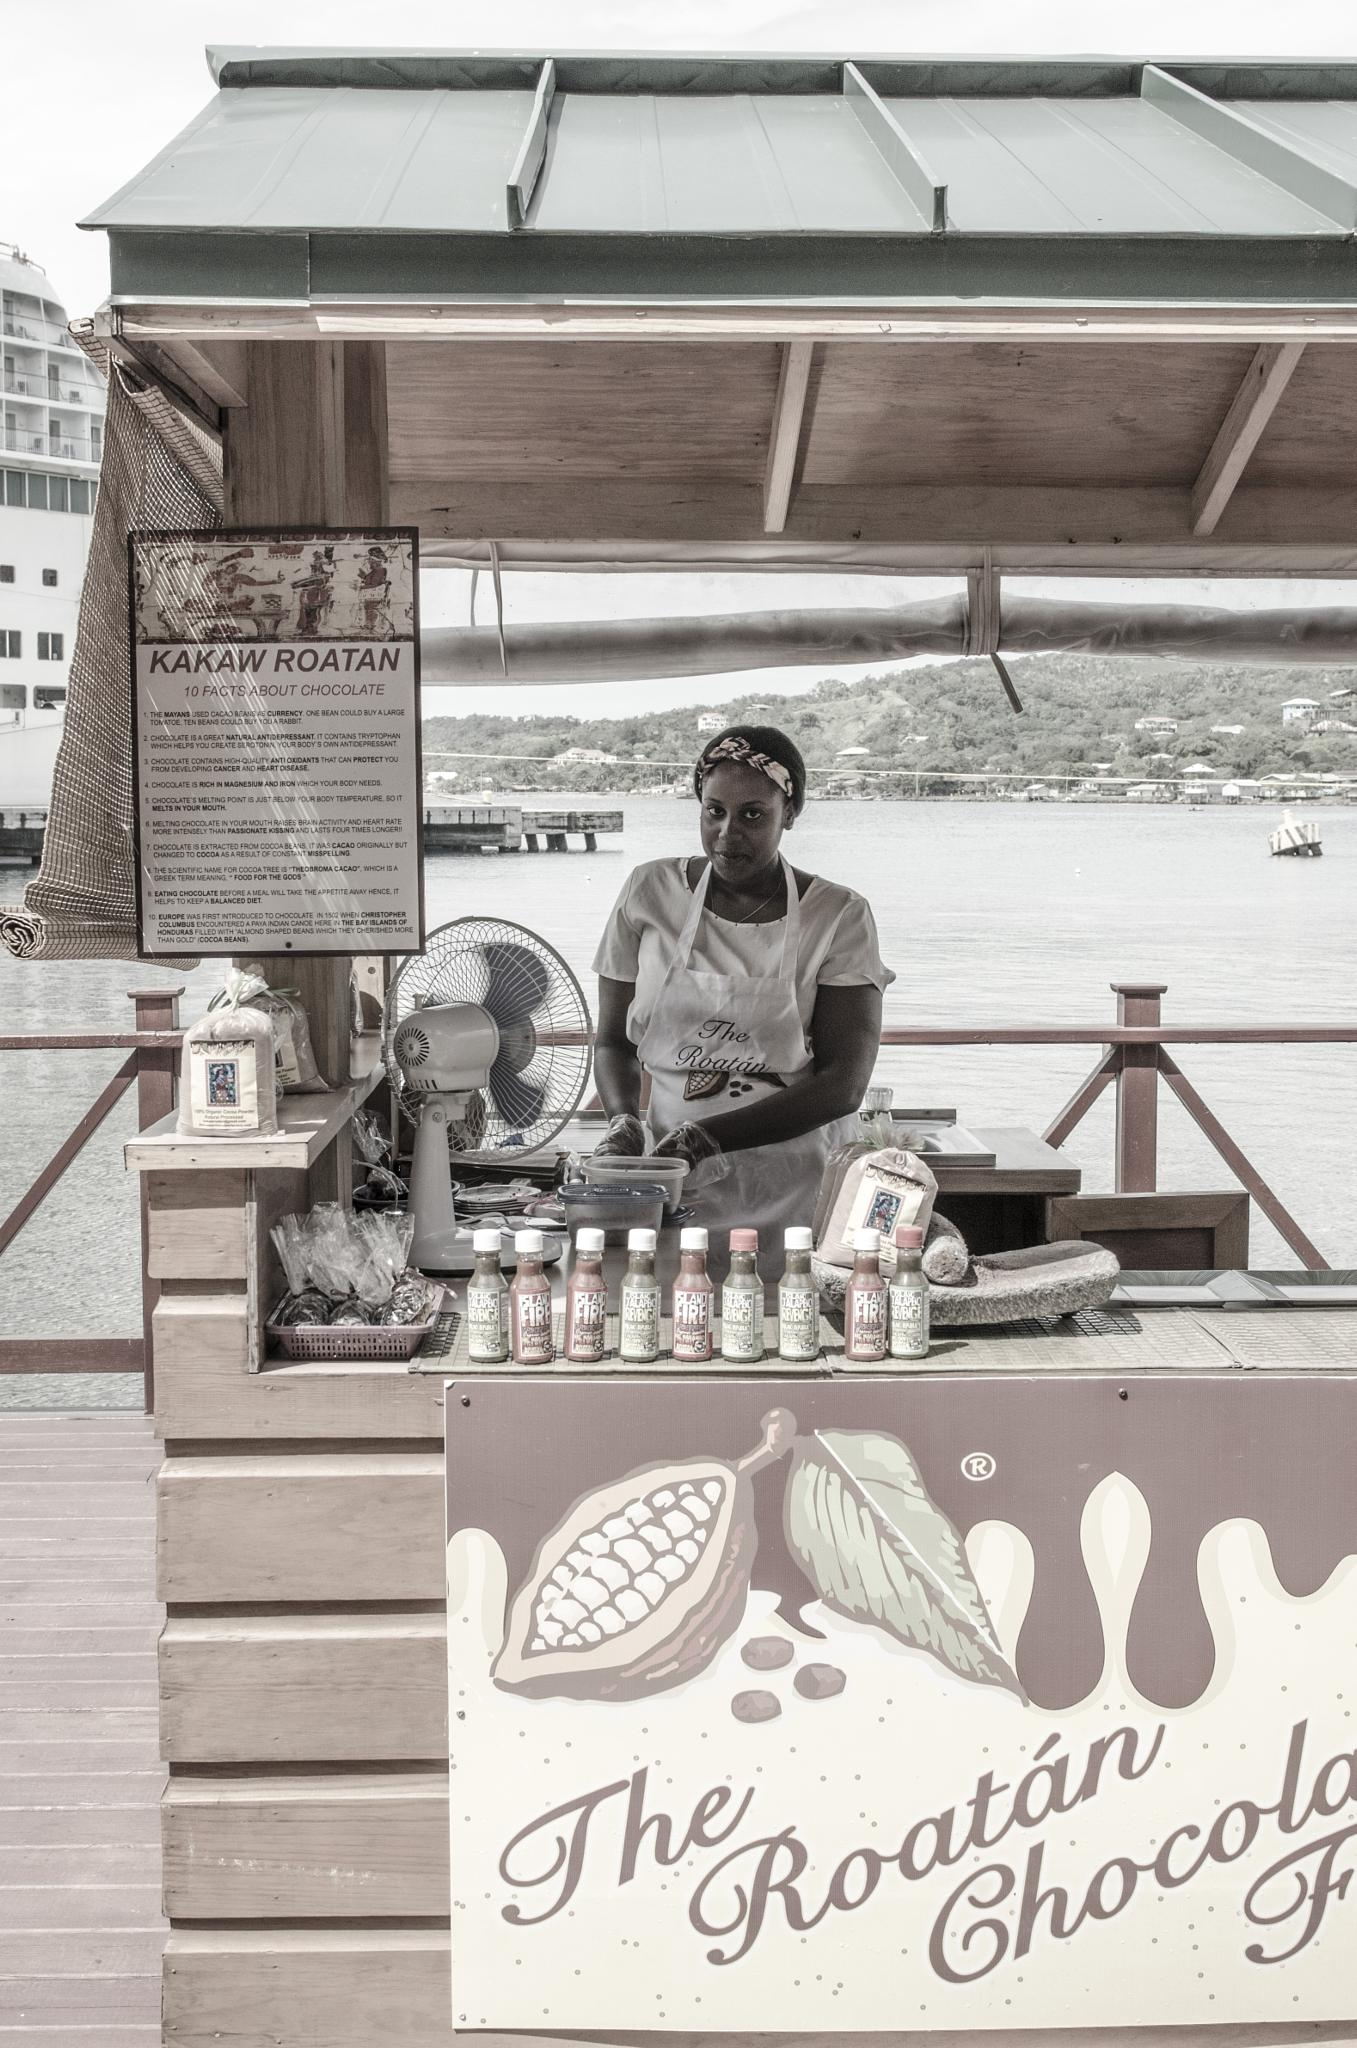 The Roatan Chocolate Factory by davidpinter